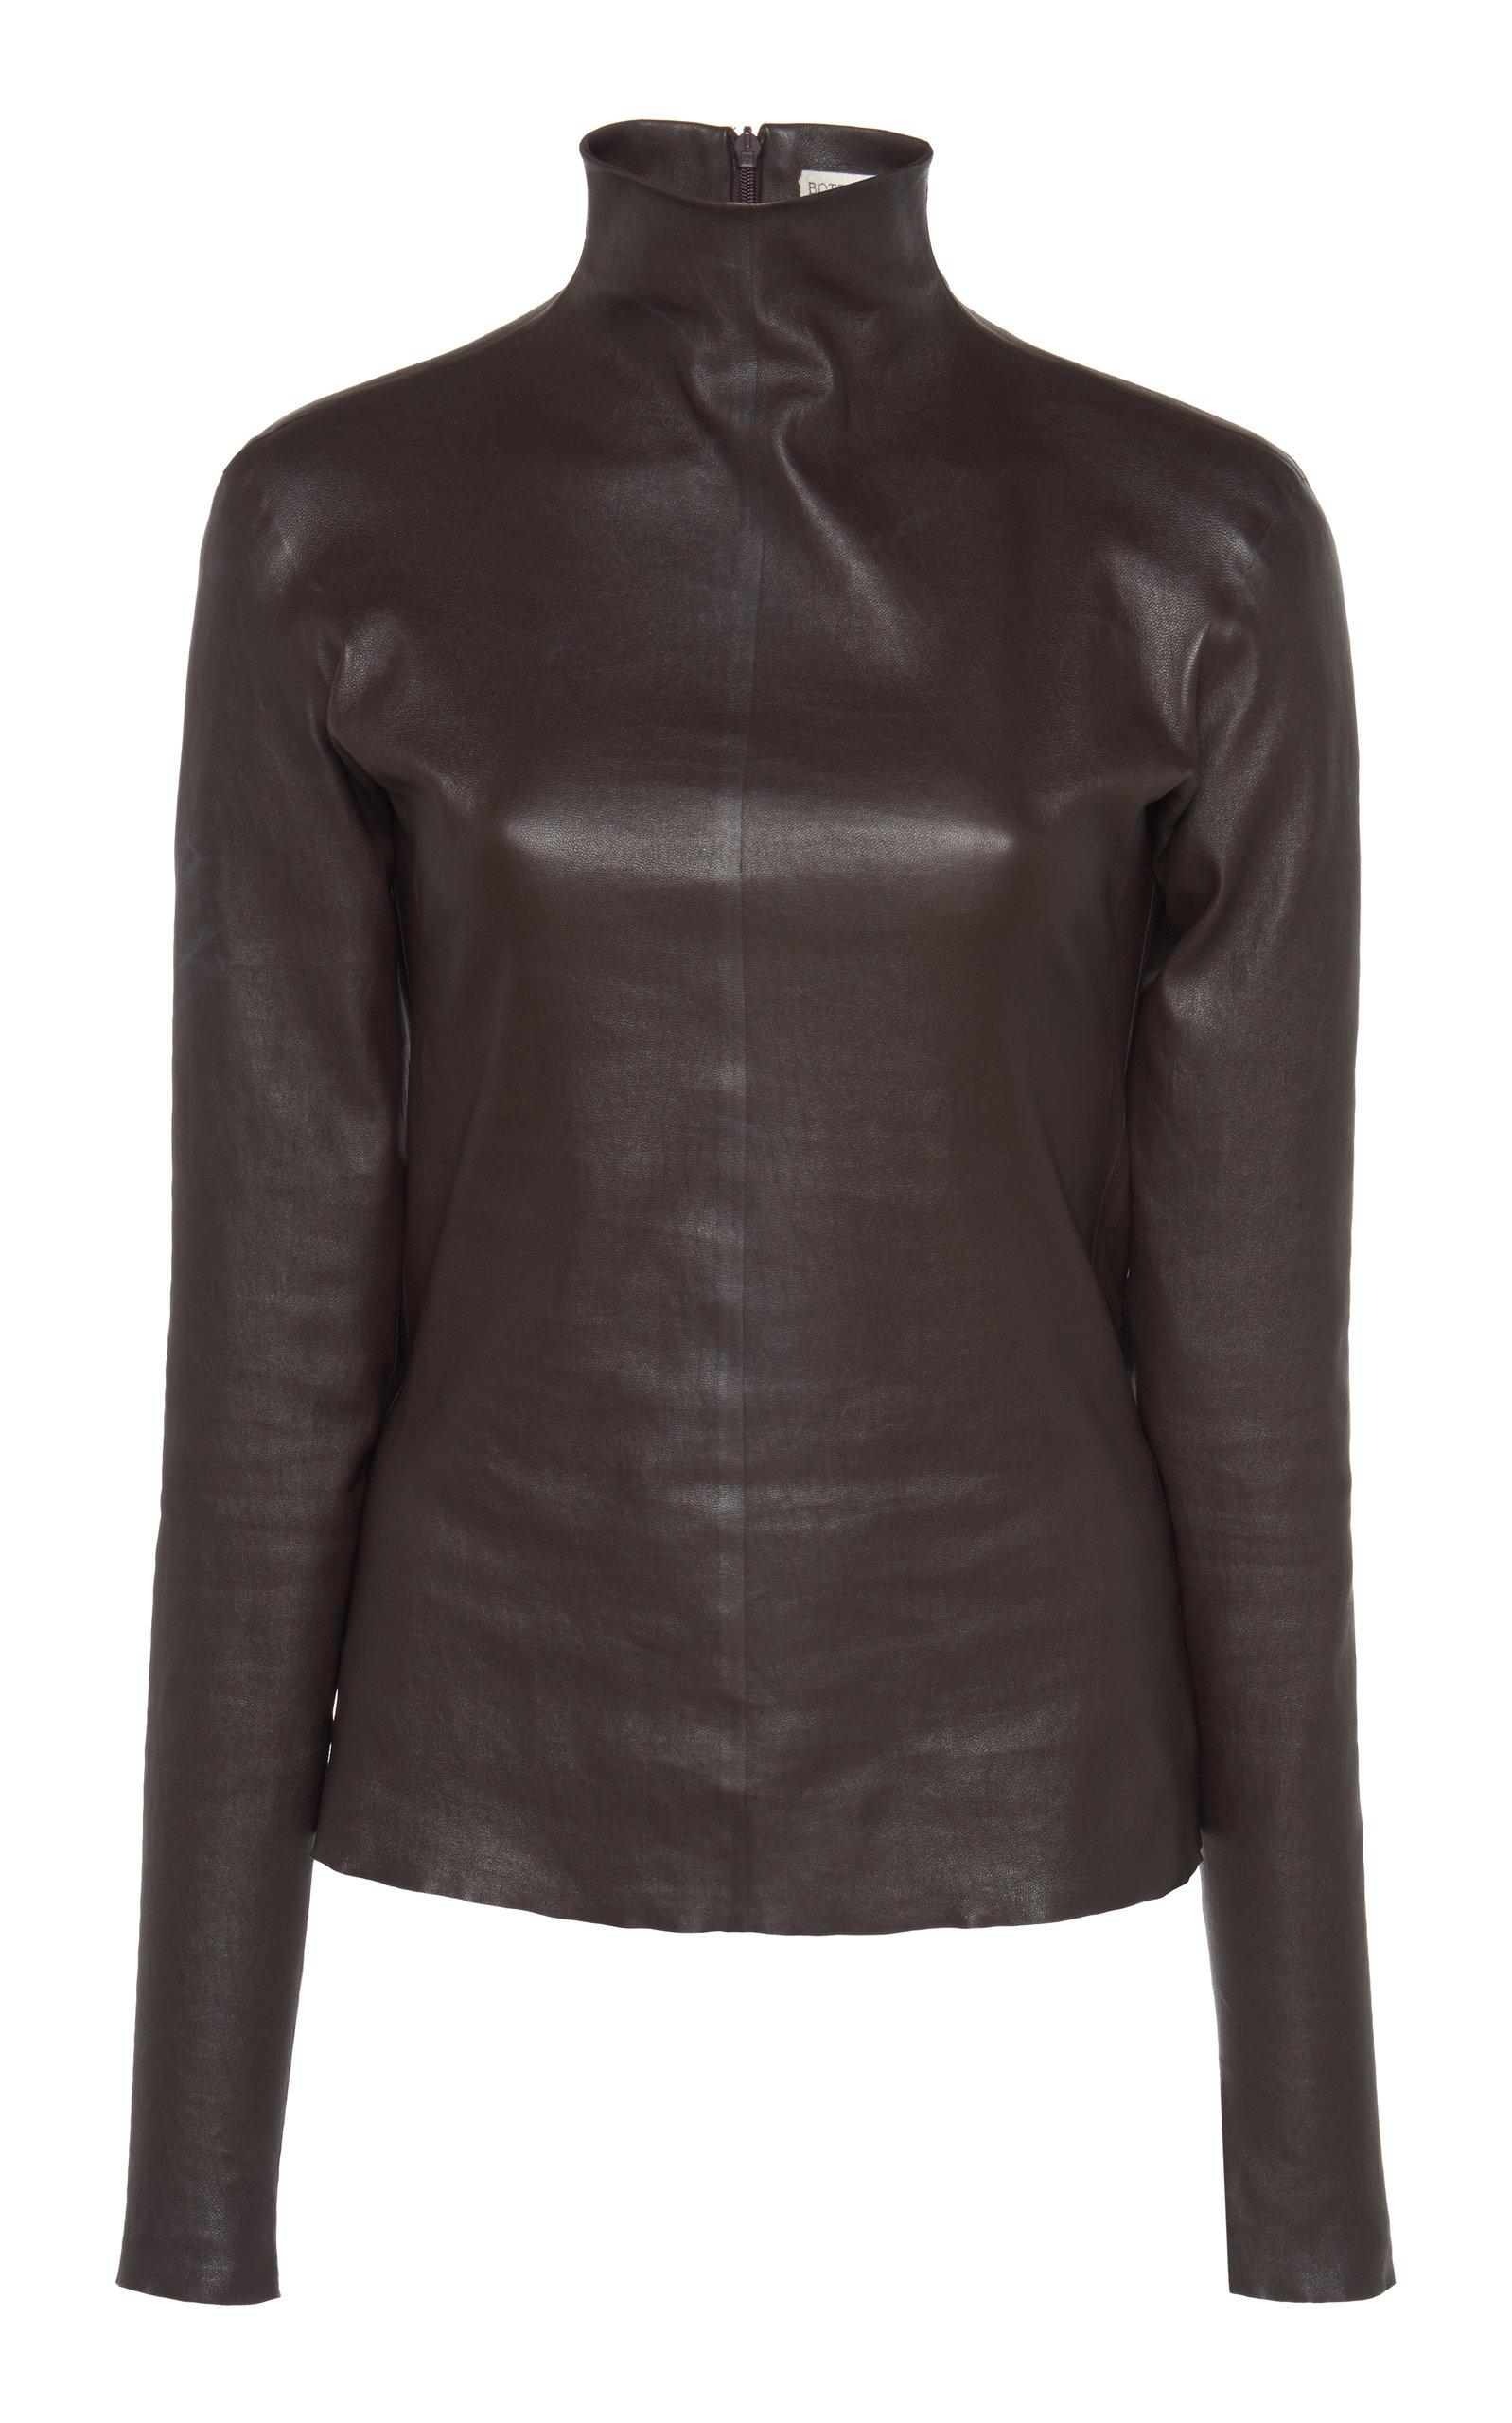 Bottega Veneta Tops Mock Neck Leather Top